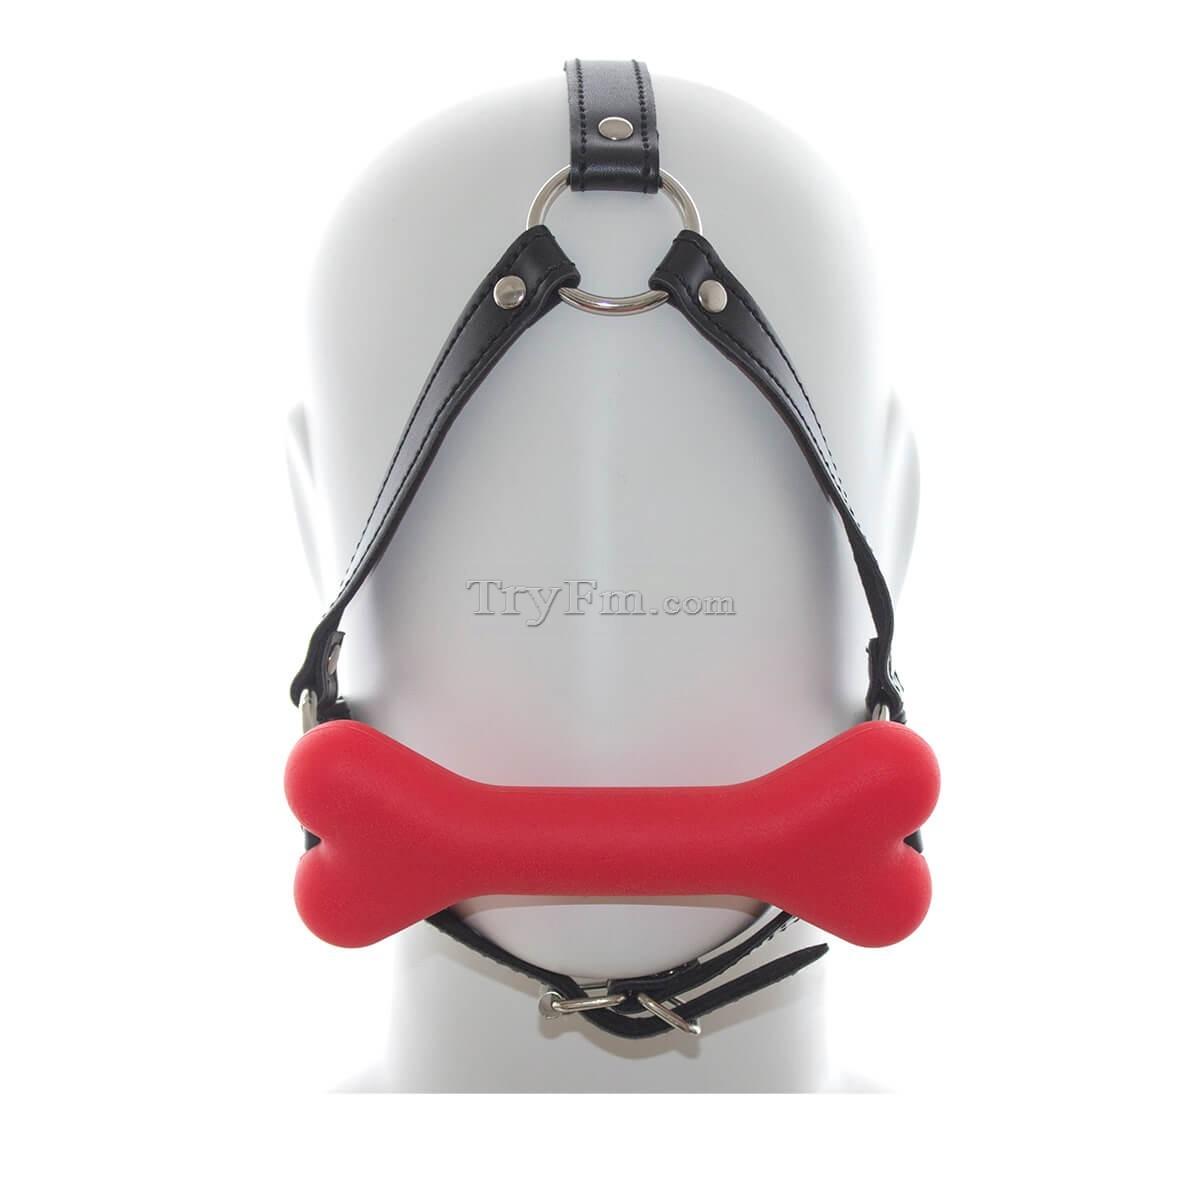 13-Hound-Bone-Gag-Head-Harness-red-2.jpg